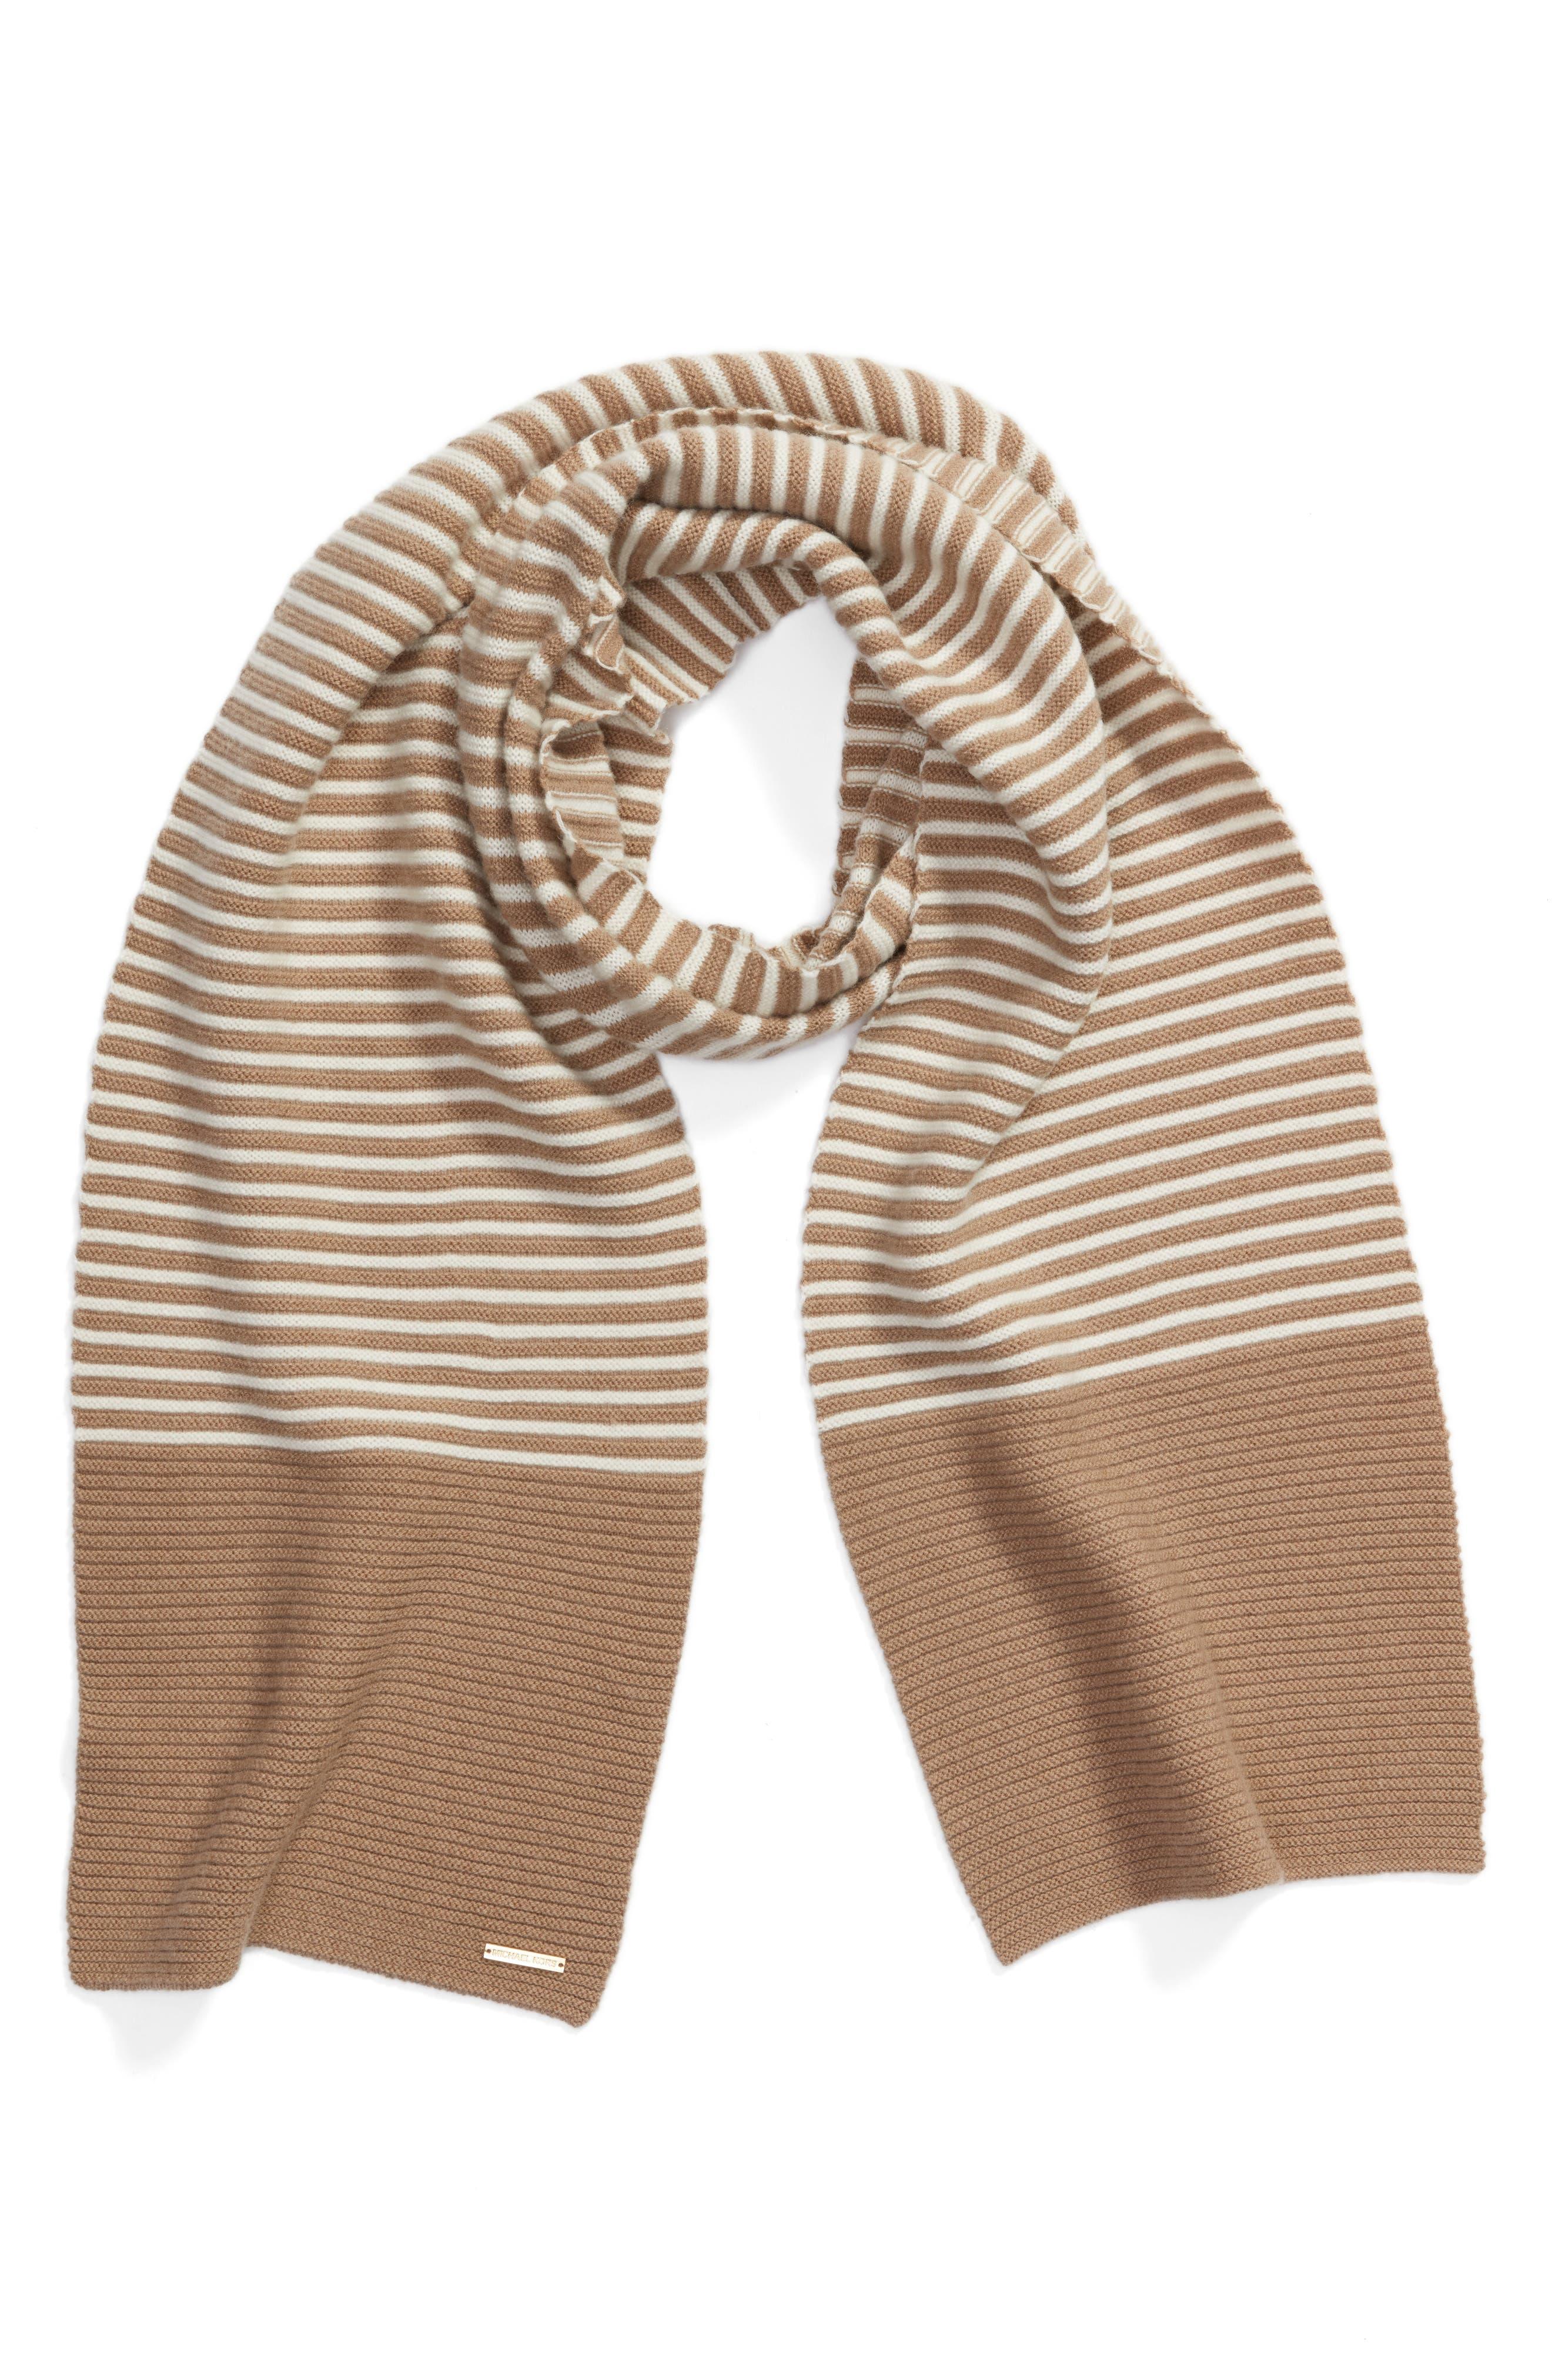 Alternate Image 3  - MICHAEL Michael Kors Double Links Wool & Cashmere Scarf